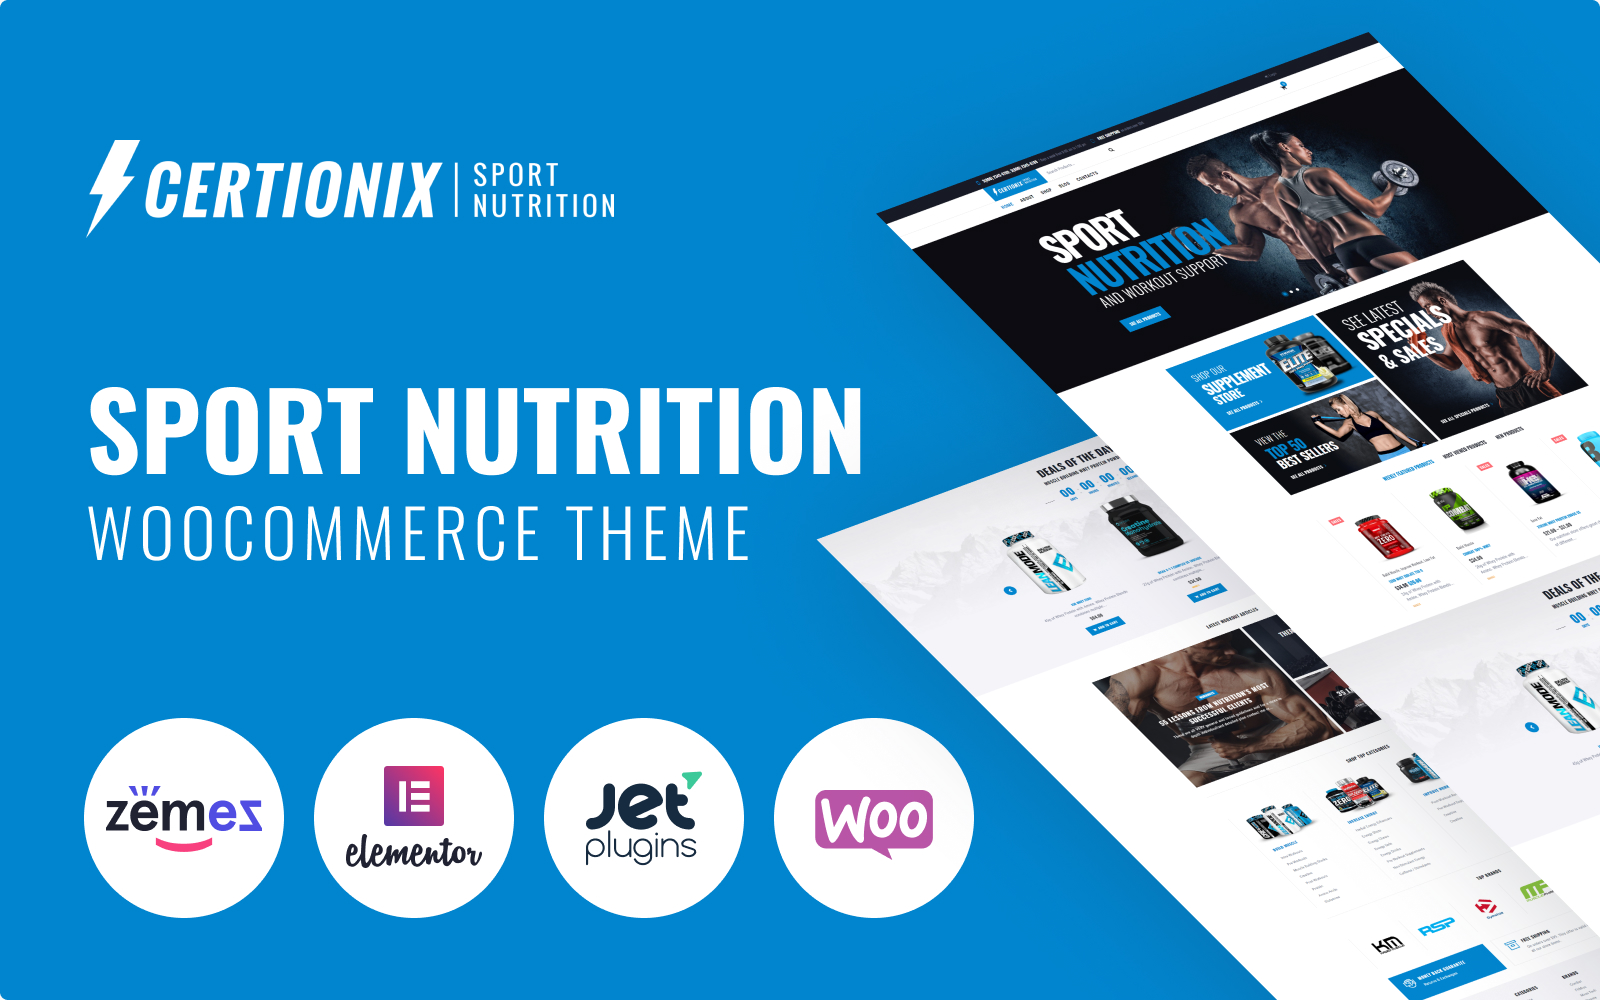 Reszponzív Certionix - Sport Nutrition Website Template with Woocommerce and Elementor WooCommerce sablon 65870